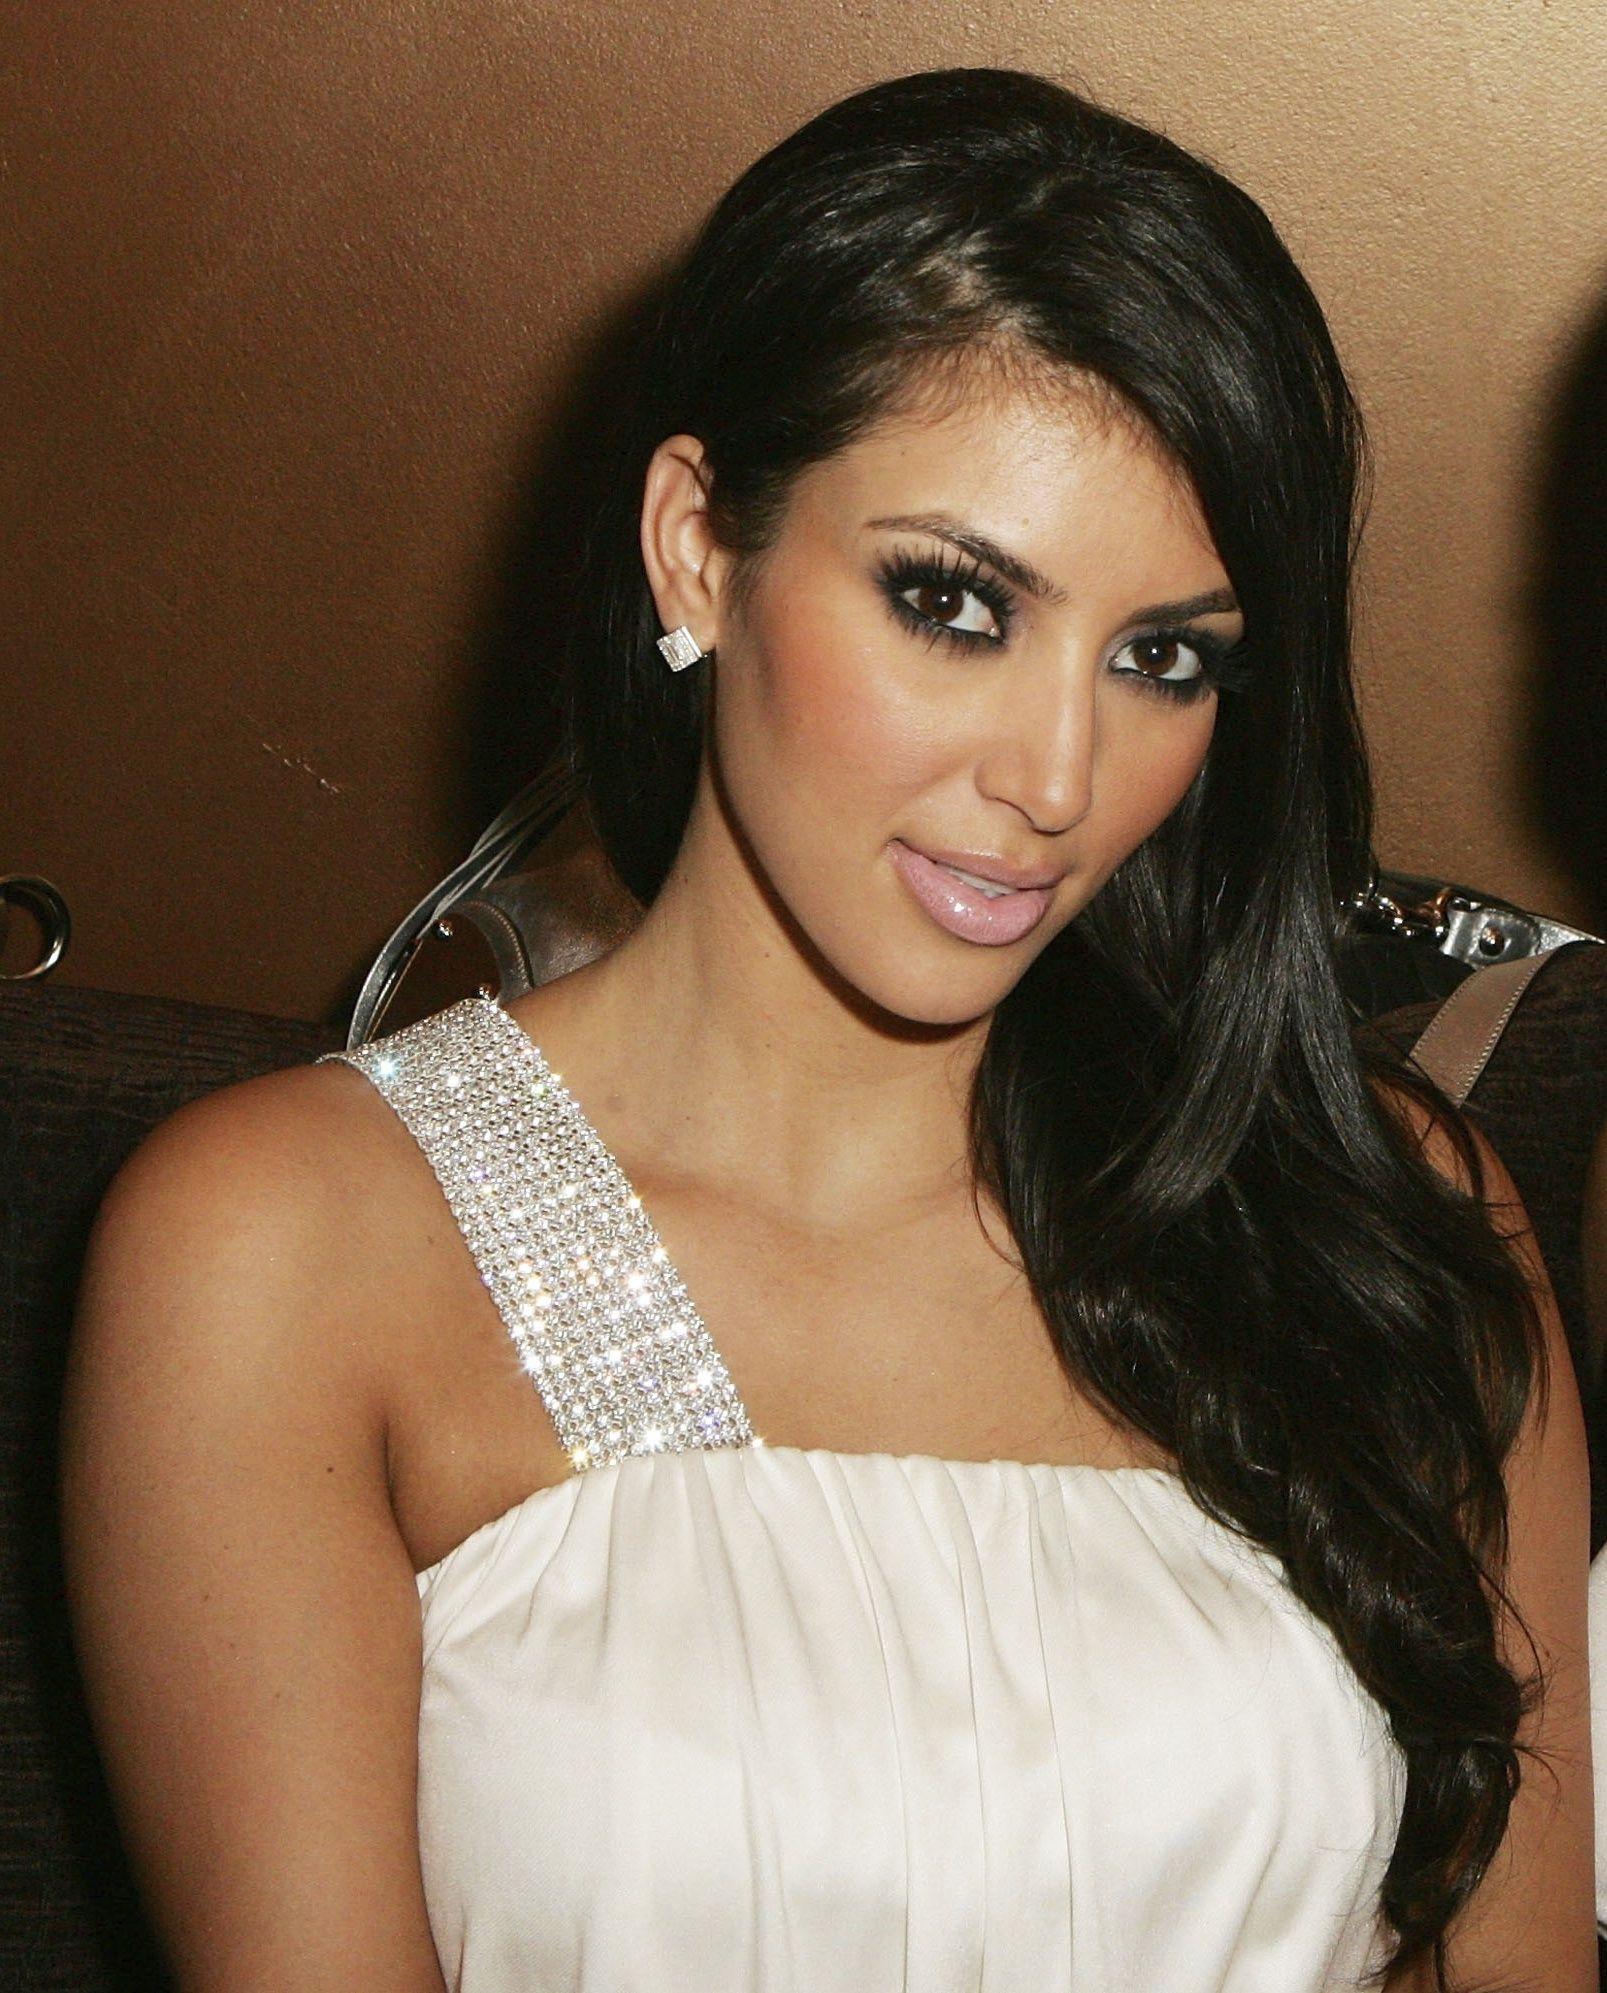 Kim Kardashian Hair Makeup Kim Kardashian Makeup Kim Kardashian Hair Celebrity Fashion Looks